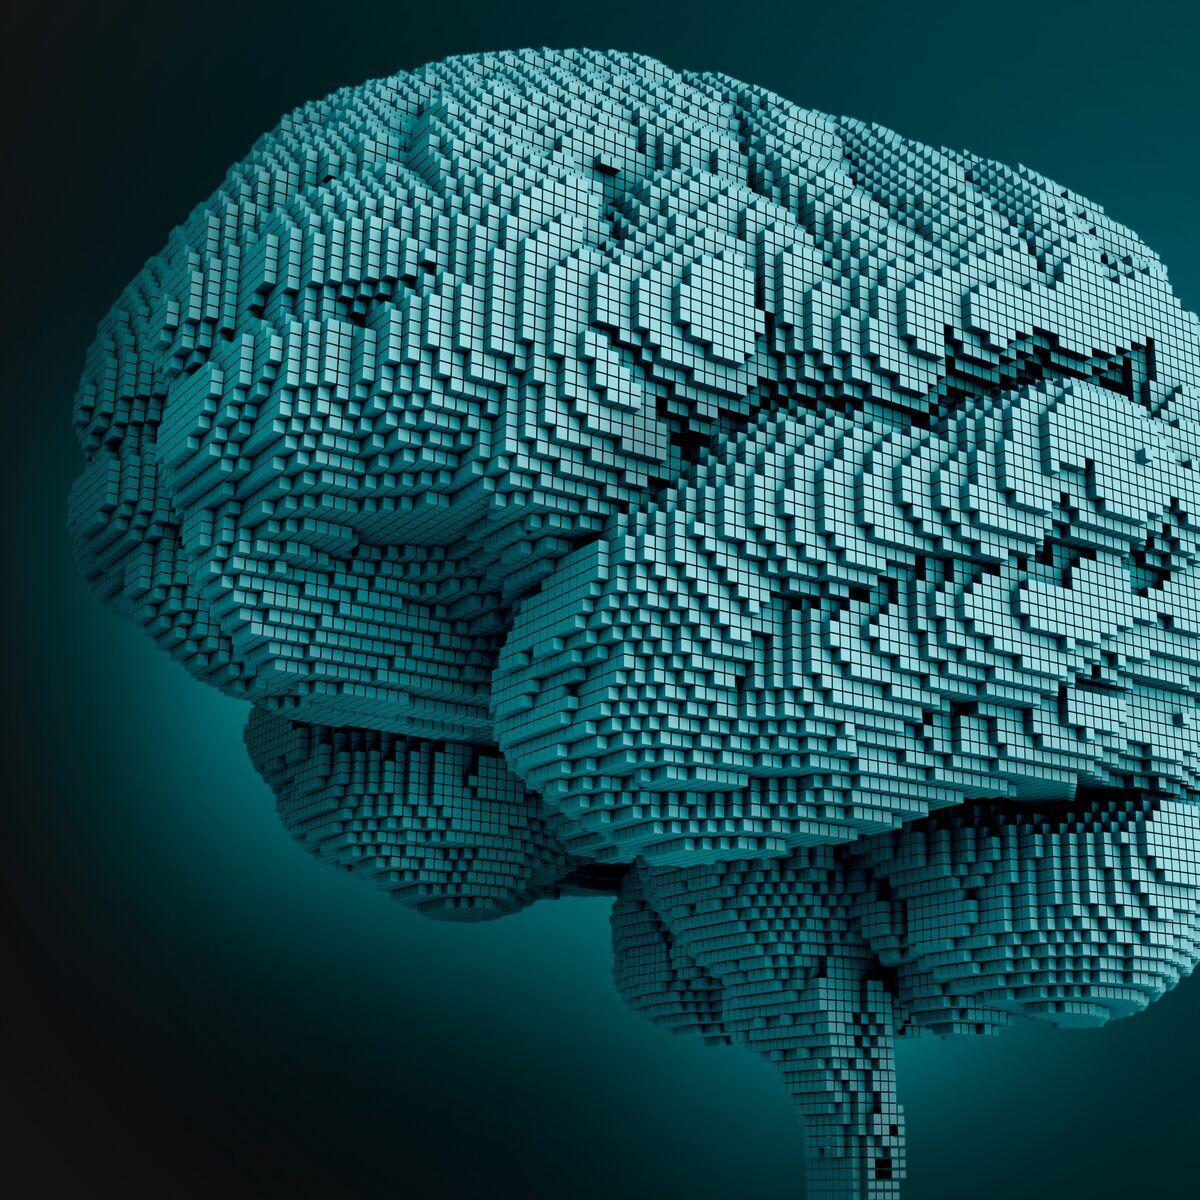 1x1_Brain_3200x3200_preview.jpeg